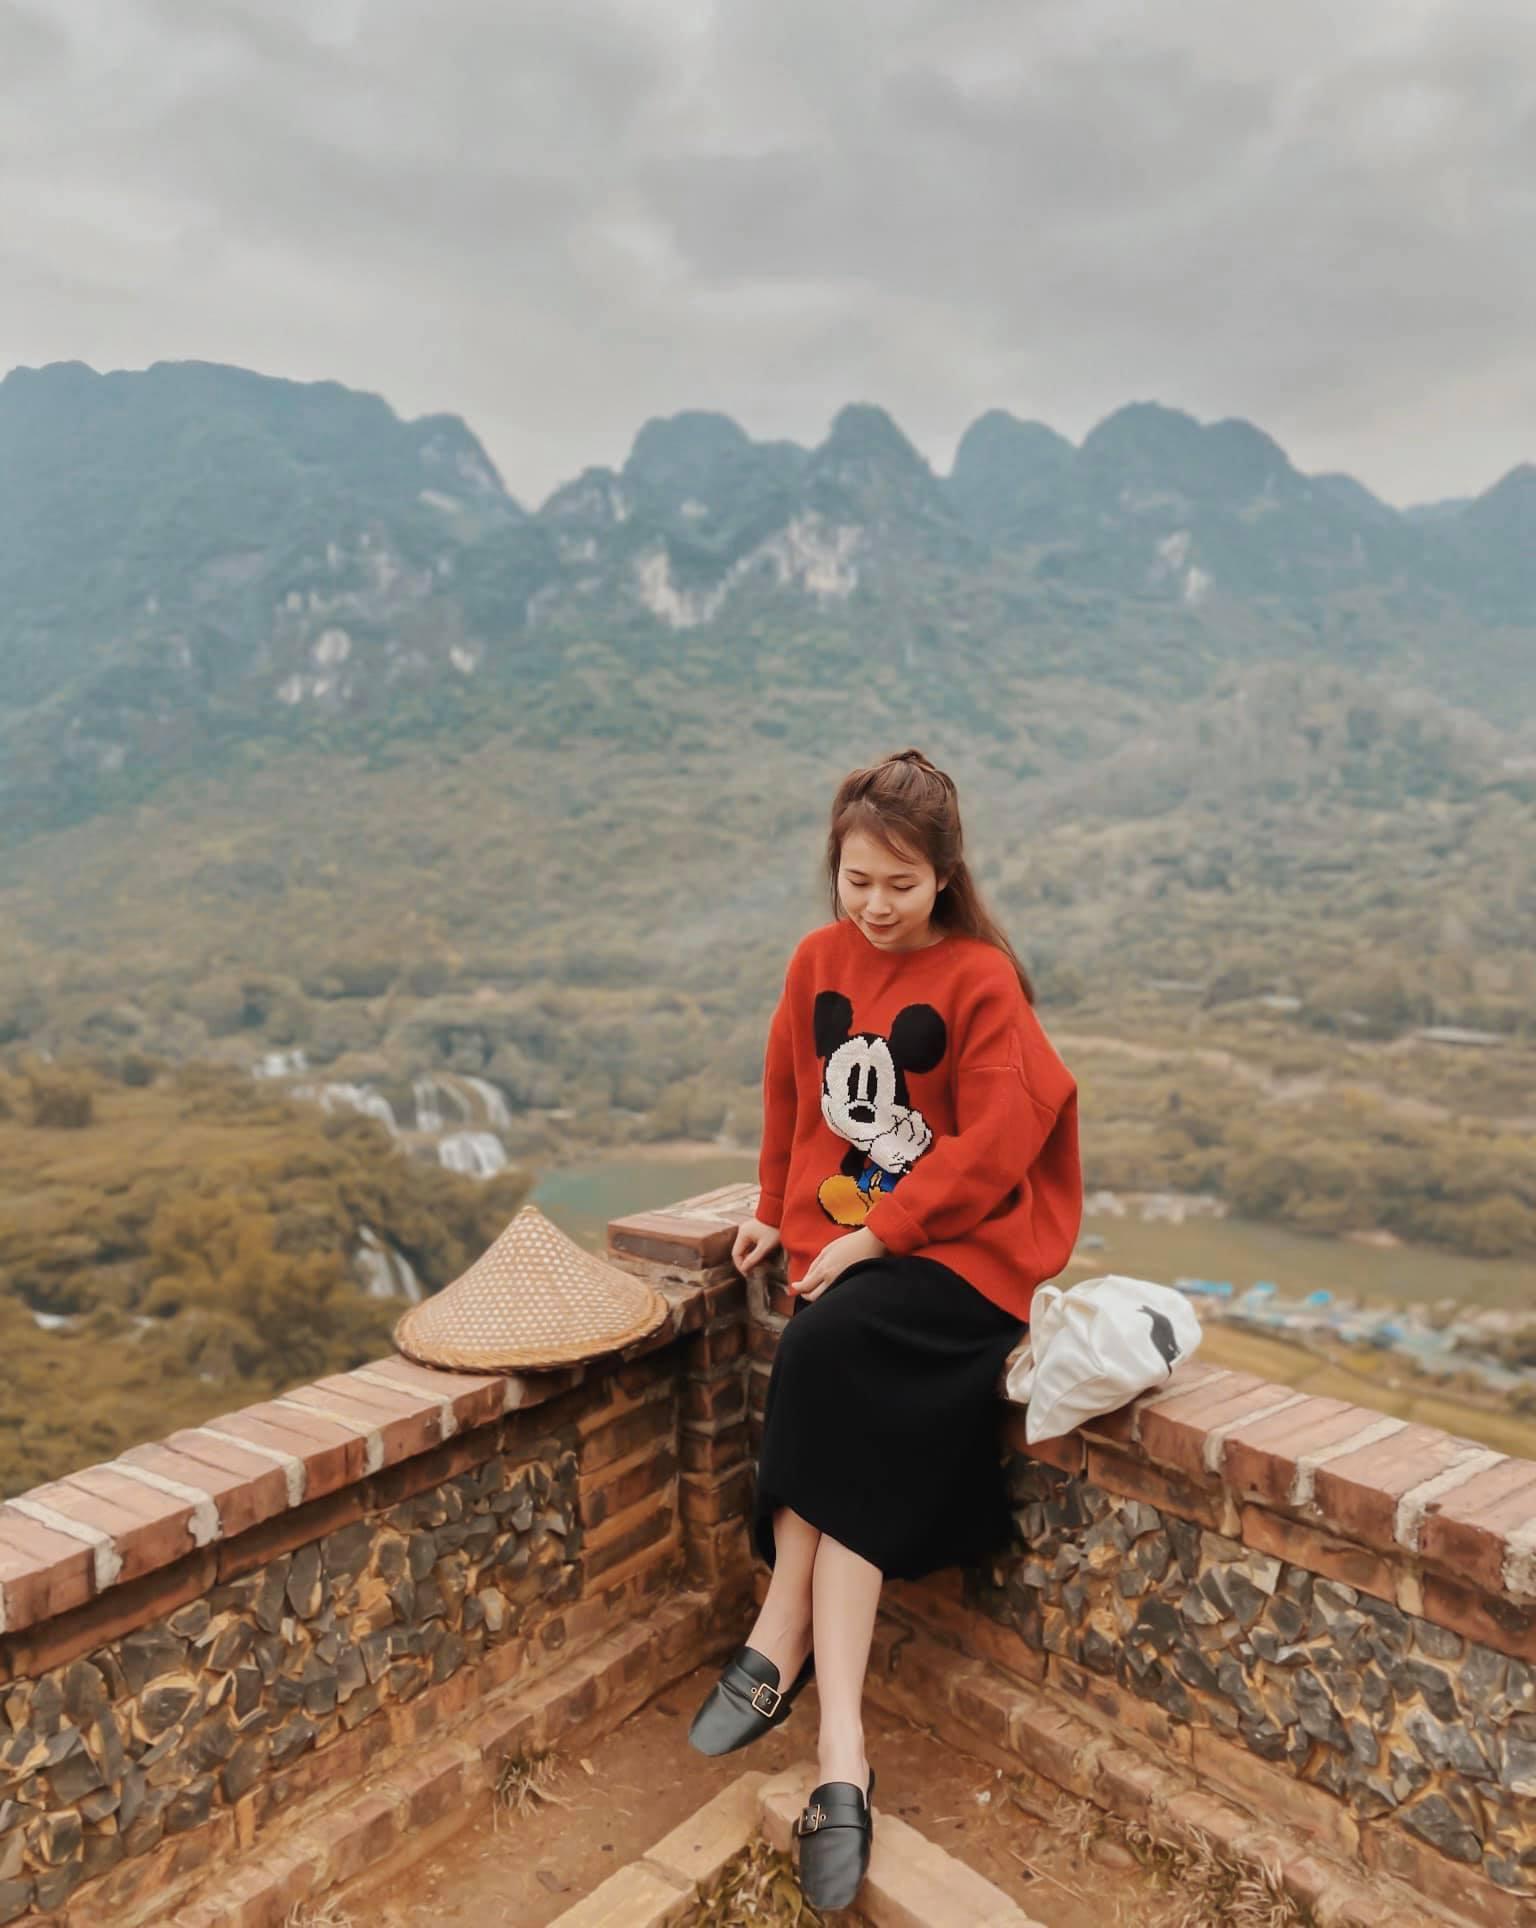 Tong-hop-nhung-dia-diem-du-lich-nui-hot-nhat-trong-dip-30-thang-4-vietmountain-travel111121